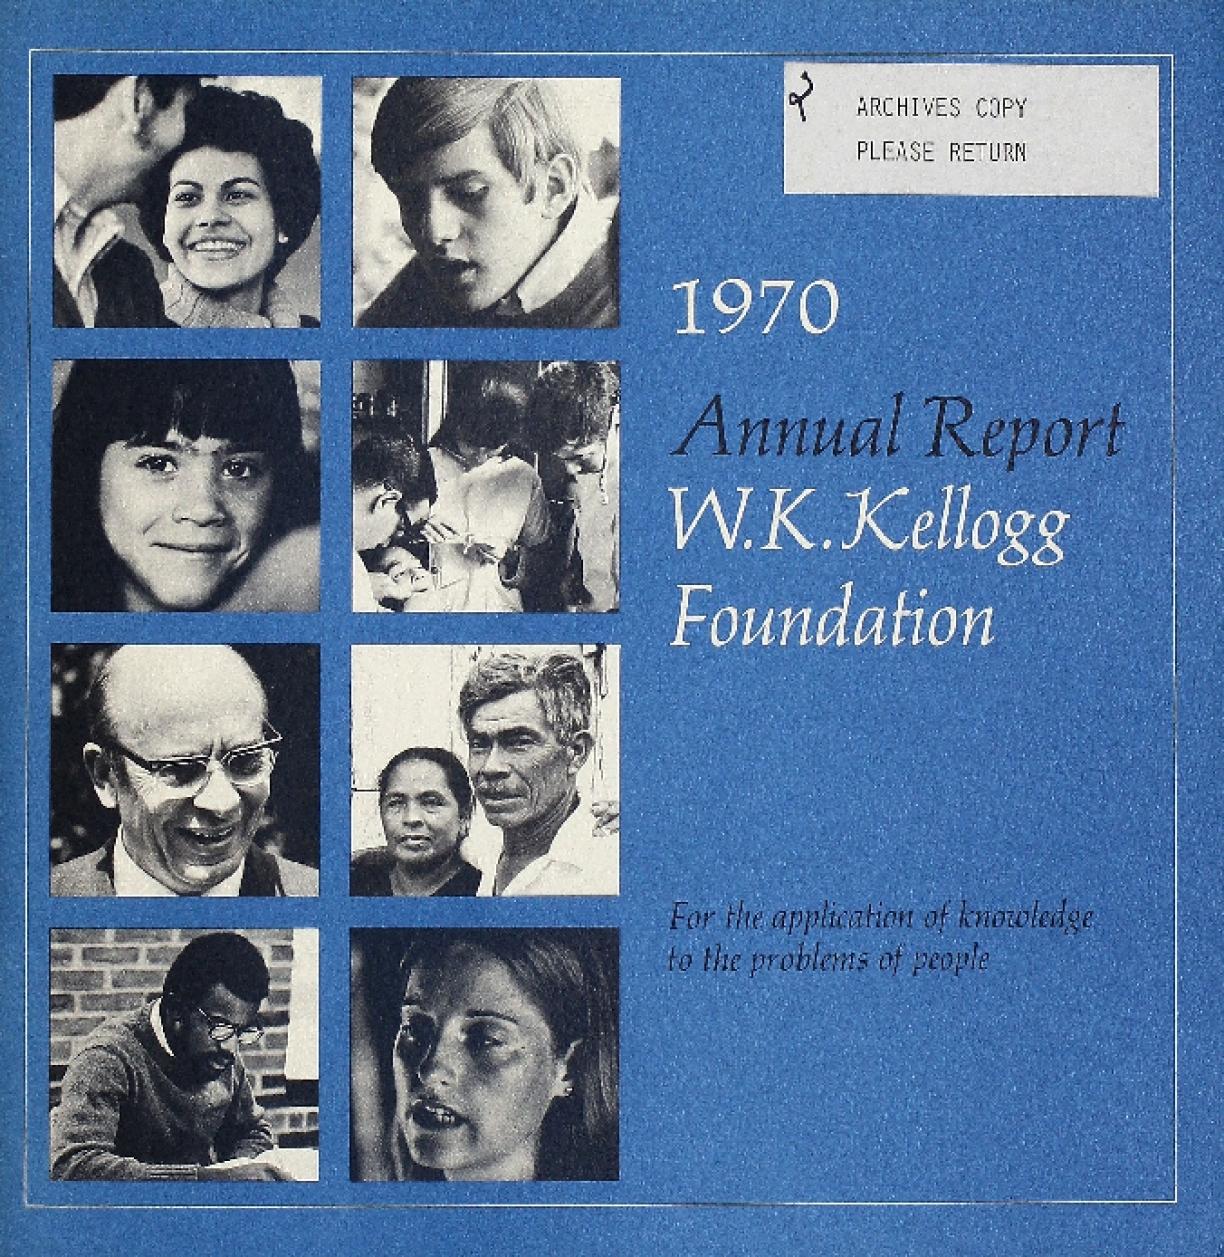 1970 W.K. Kellogg Foundation Annual Report